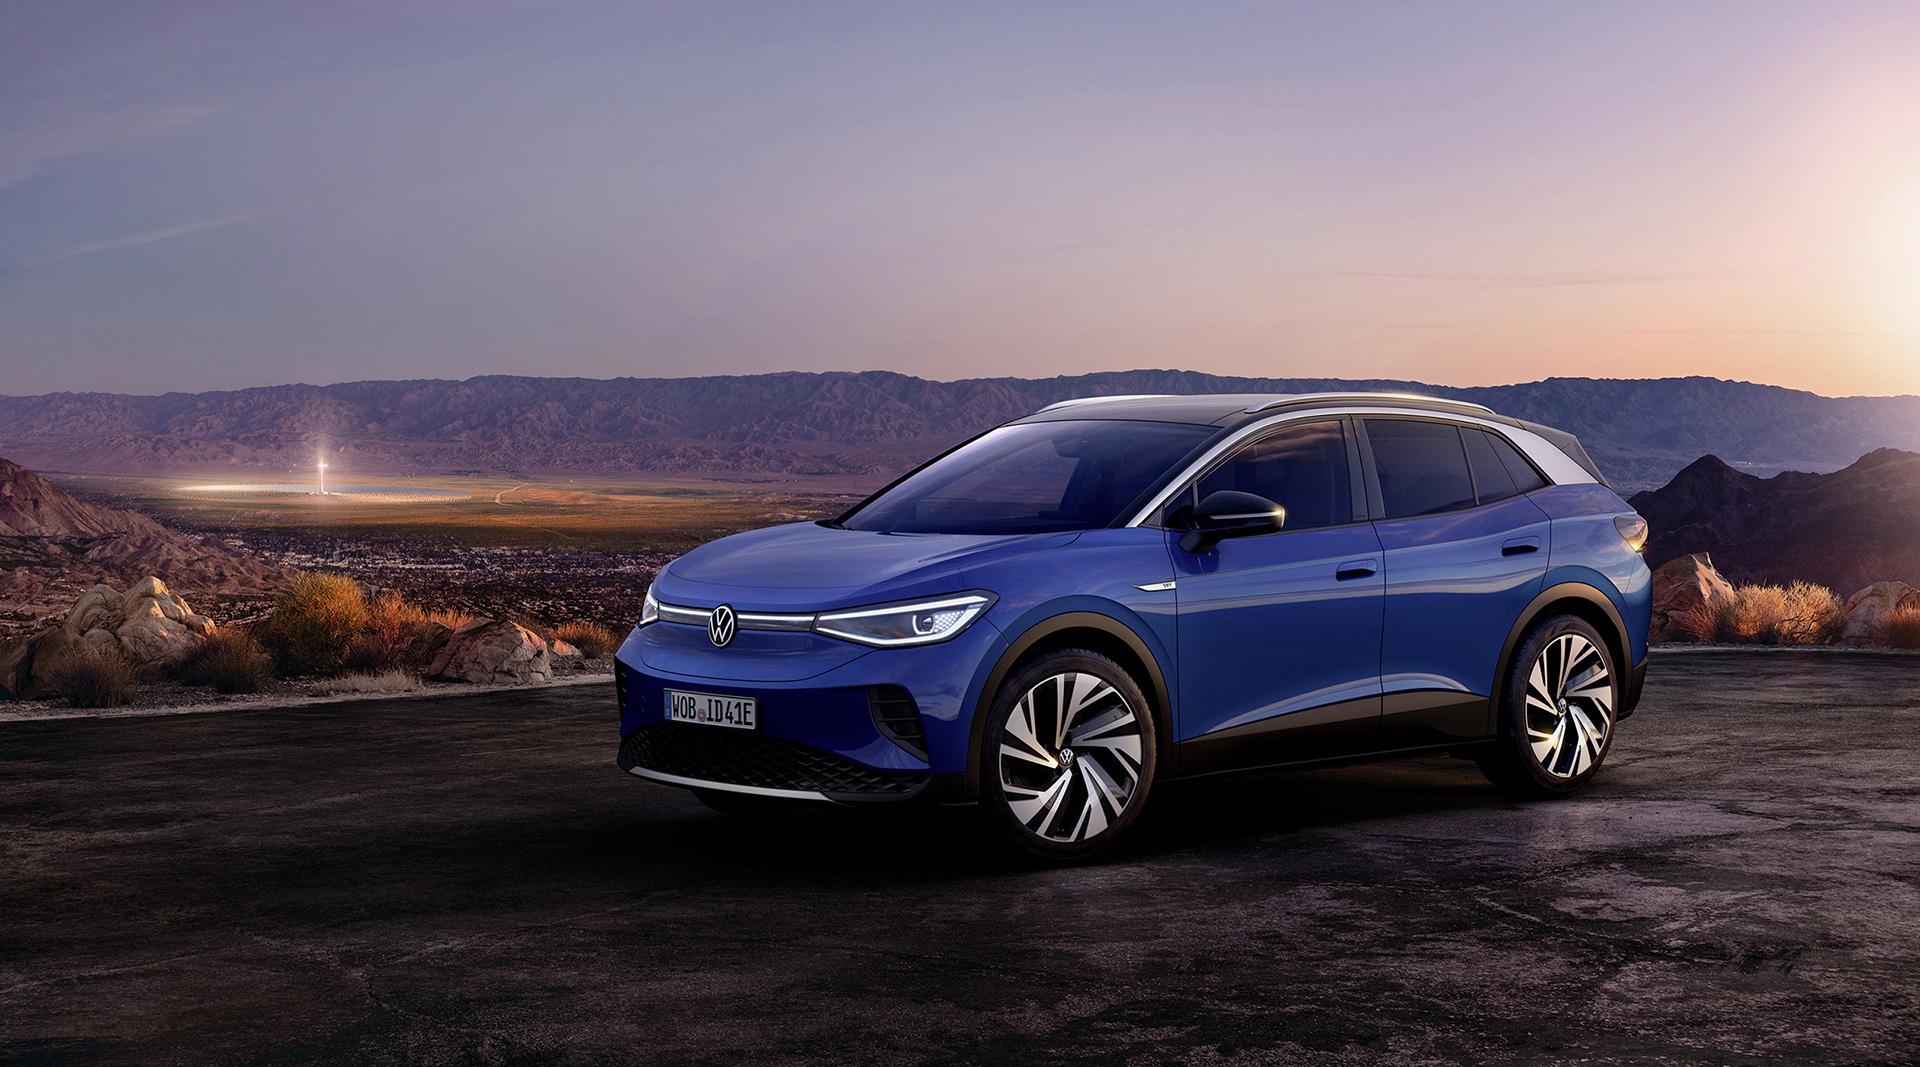 "ID.4 2 Η Volkswagen μας αφήνει να ρίξουμε μια ""ματιά"" στο μέλλον της αυτοκίνησης Electric cars, electric vehicles, ID.3, ID.4, ID.4 GTX, Volkswagen, Volkswagen Group, Volkswagen ID.3, Volkswagen ID.4, Volkswagen ID.4 GTX, VW, VW ID.3, zblog, ειδήσεις, ηλεκτρικά, ηλεκτροκινηση, κινουμαι ηλεκτρικα, Νέα"